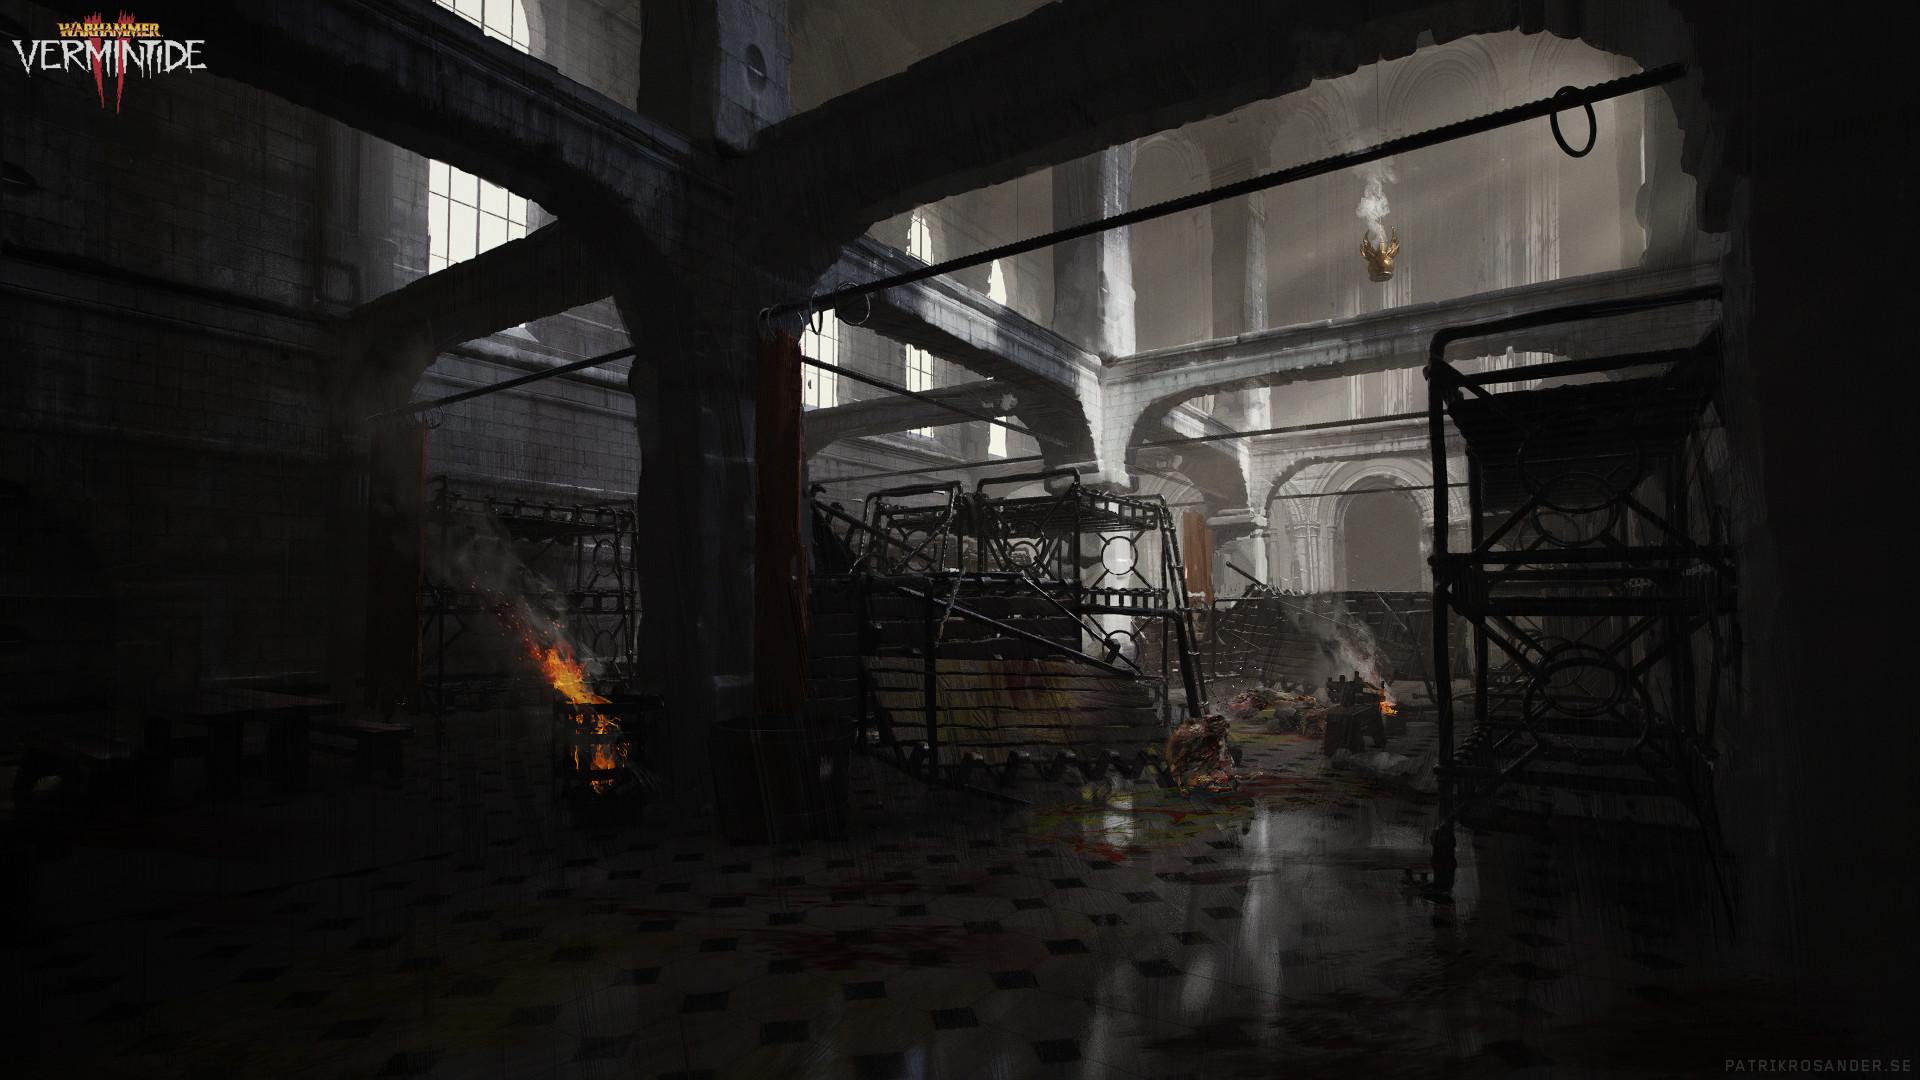 Patrik rosander convocation of decay shallya hospital